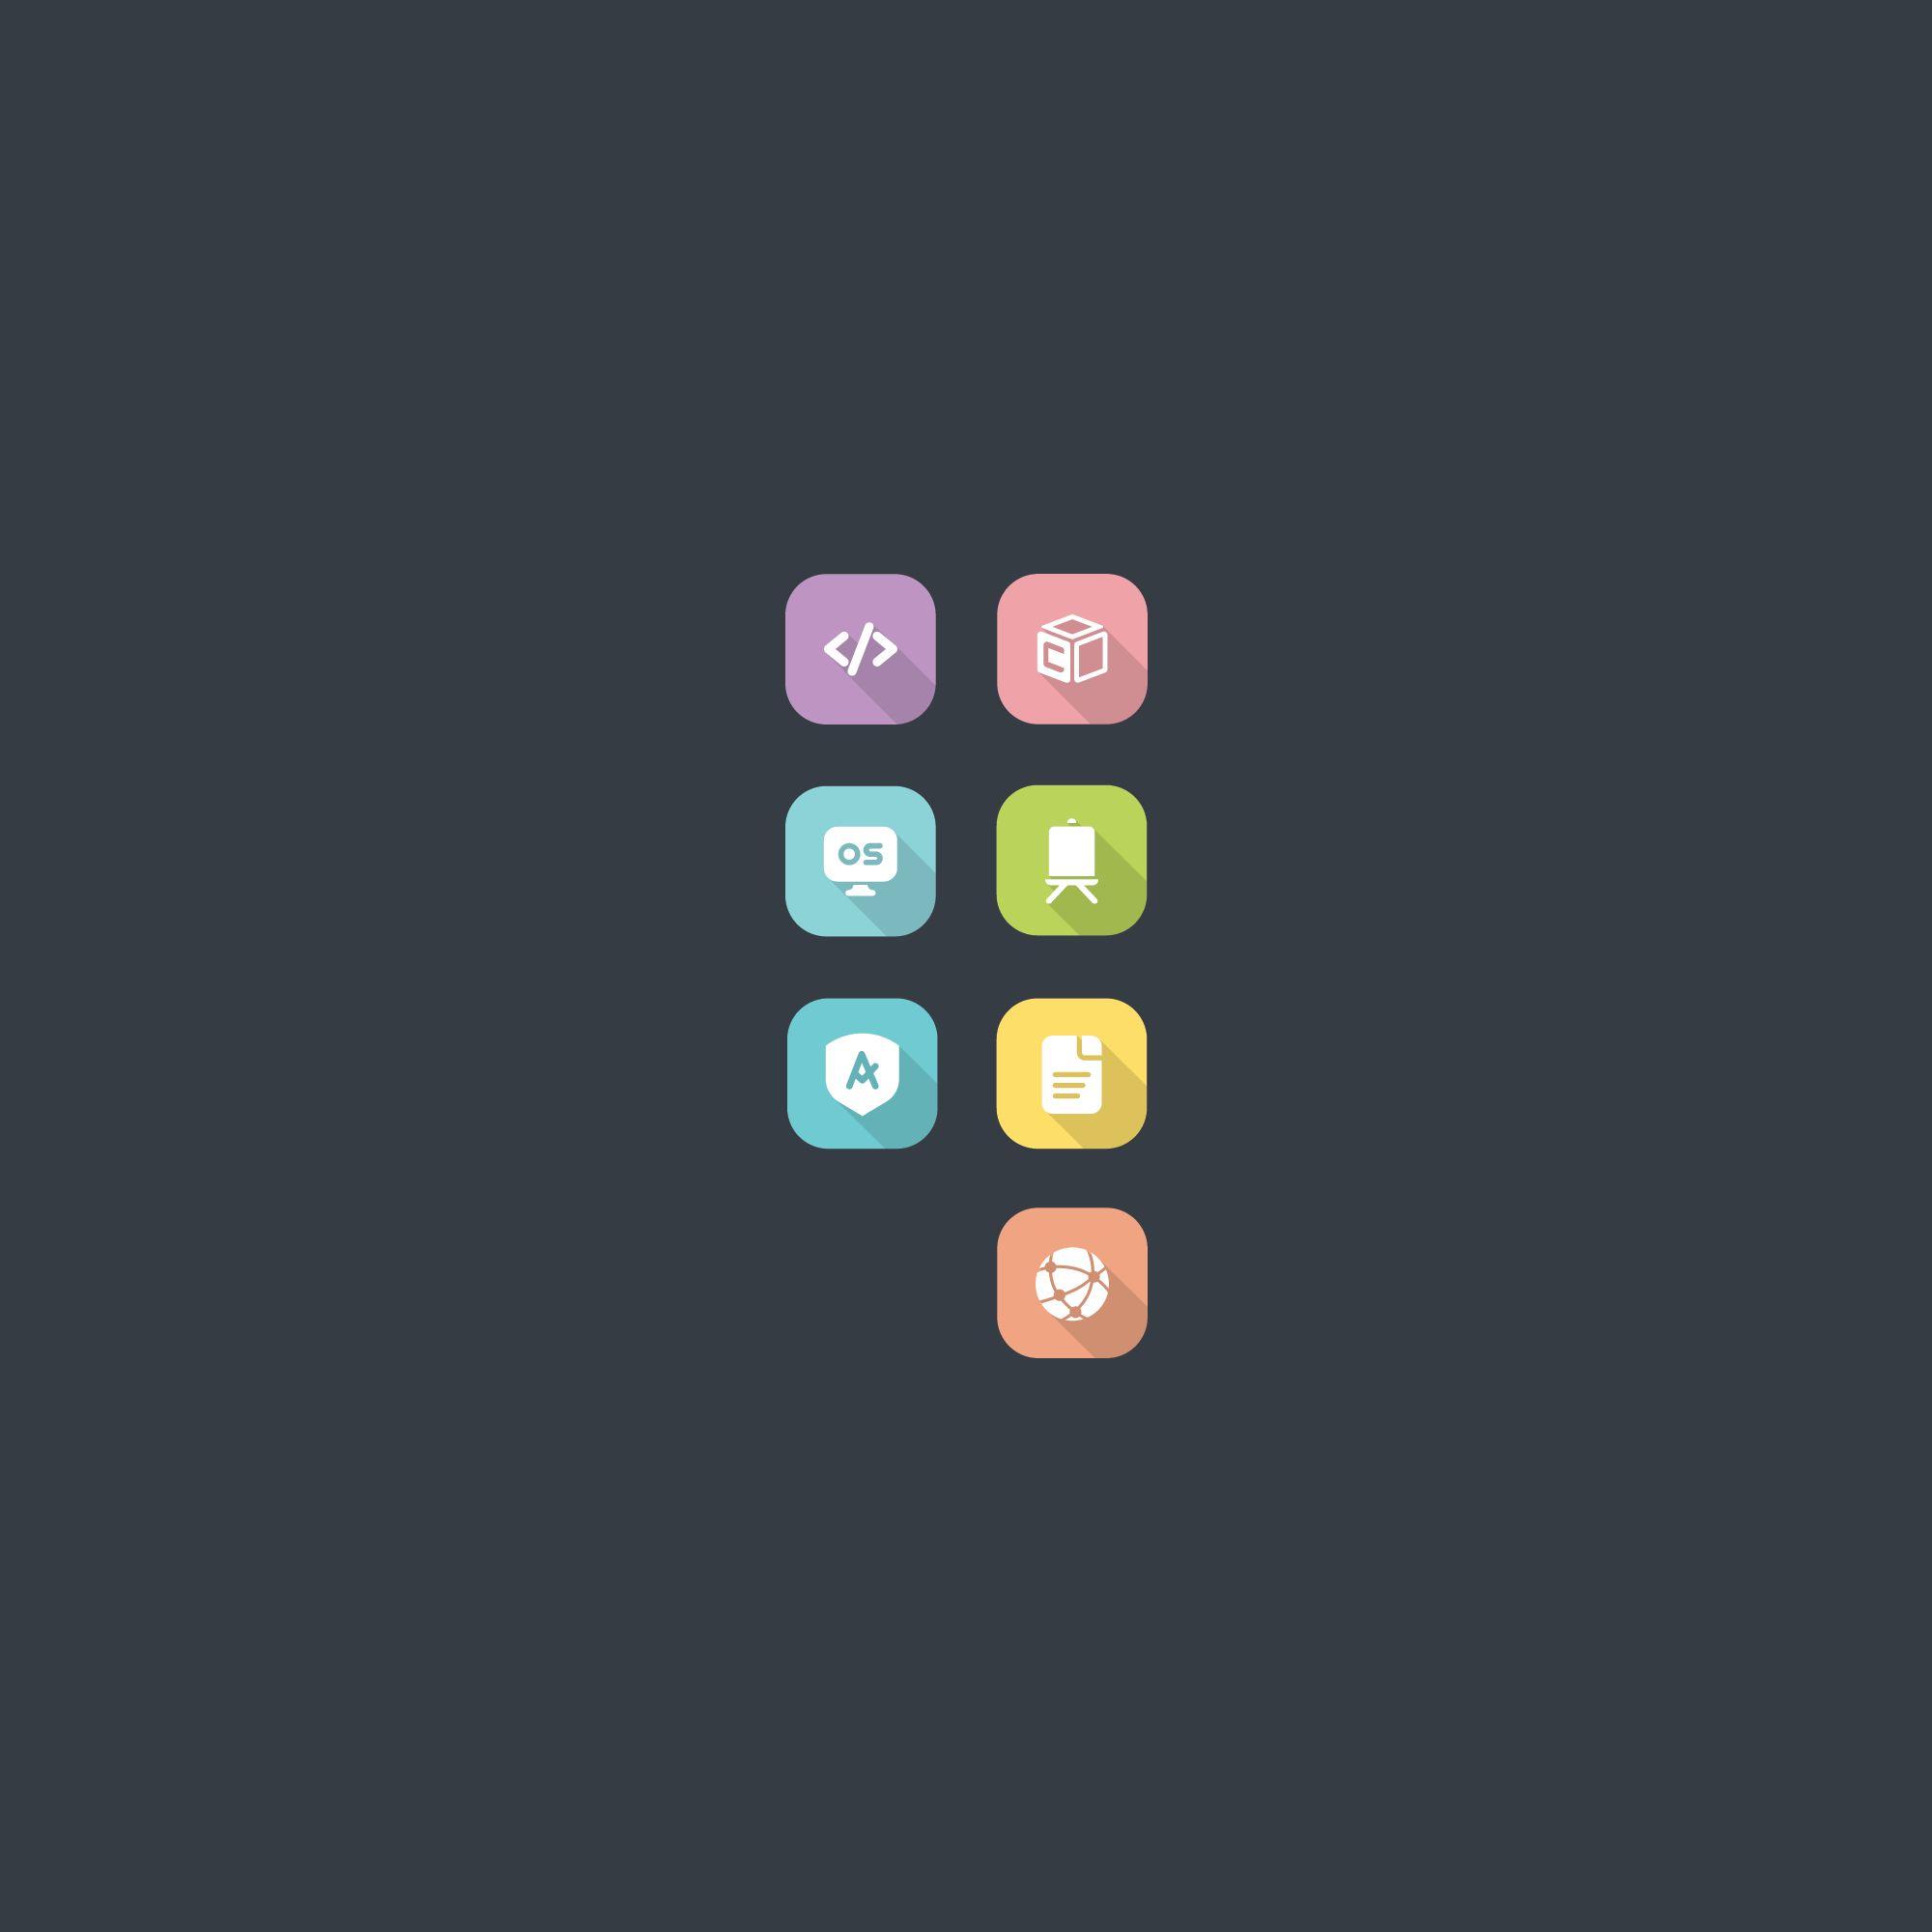 Иконка для STMP - дизайнер nuttale